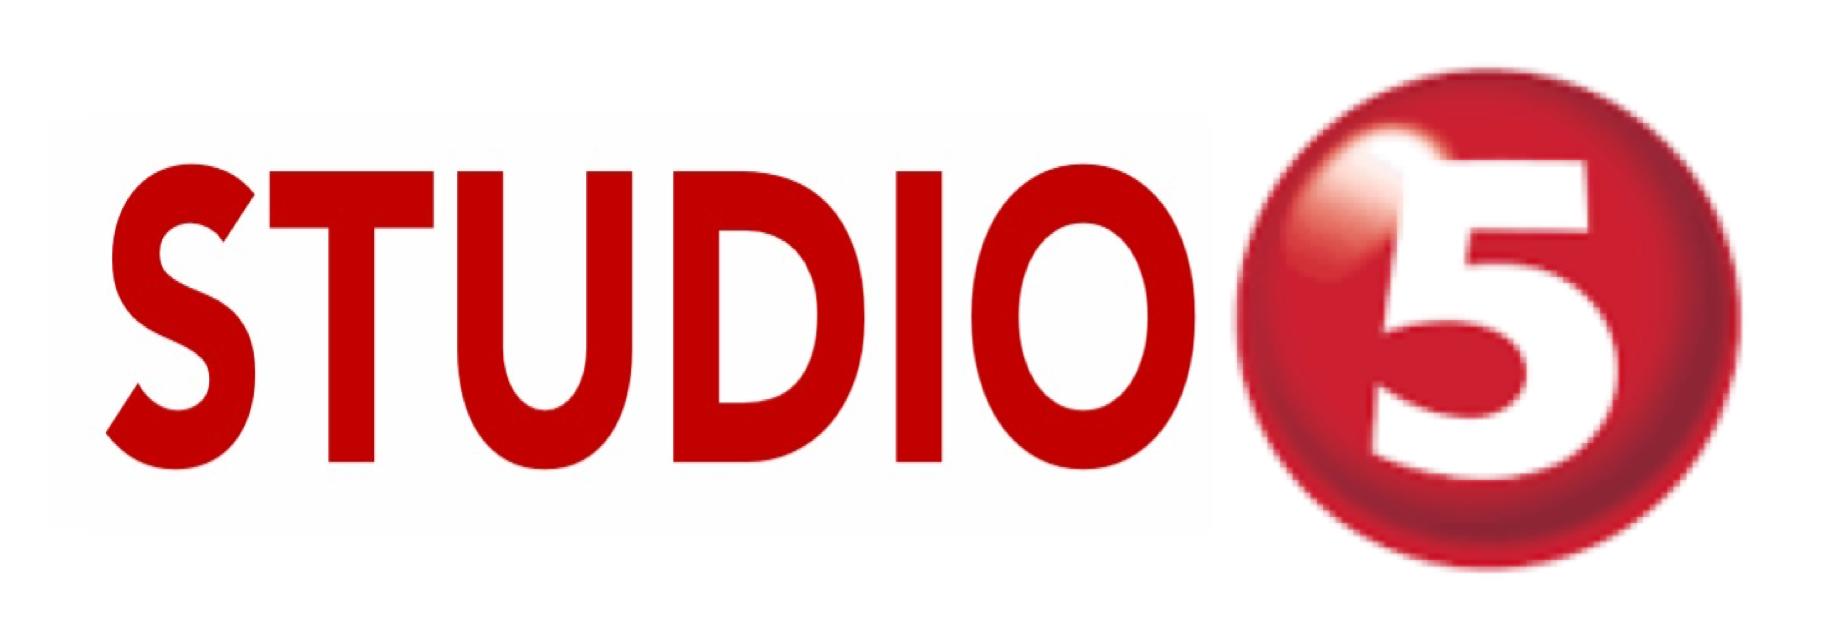 TV5 Studio5 2013 logo.jpeg